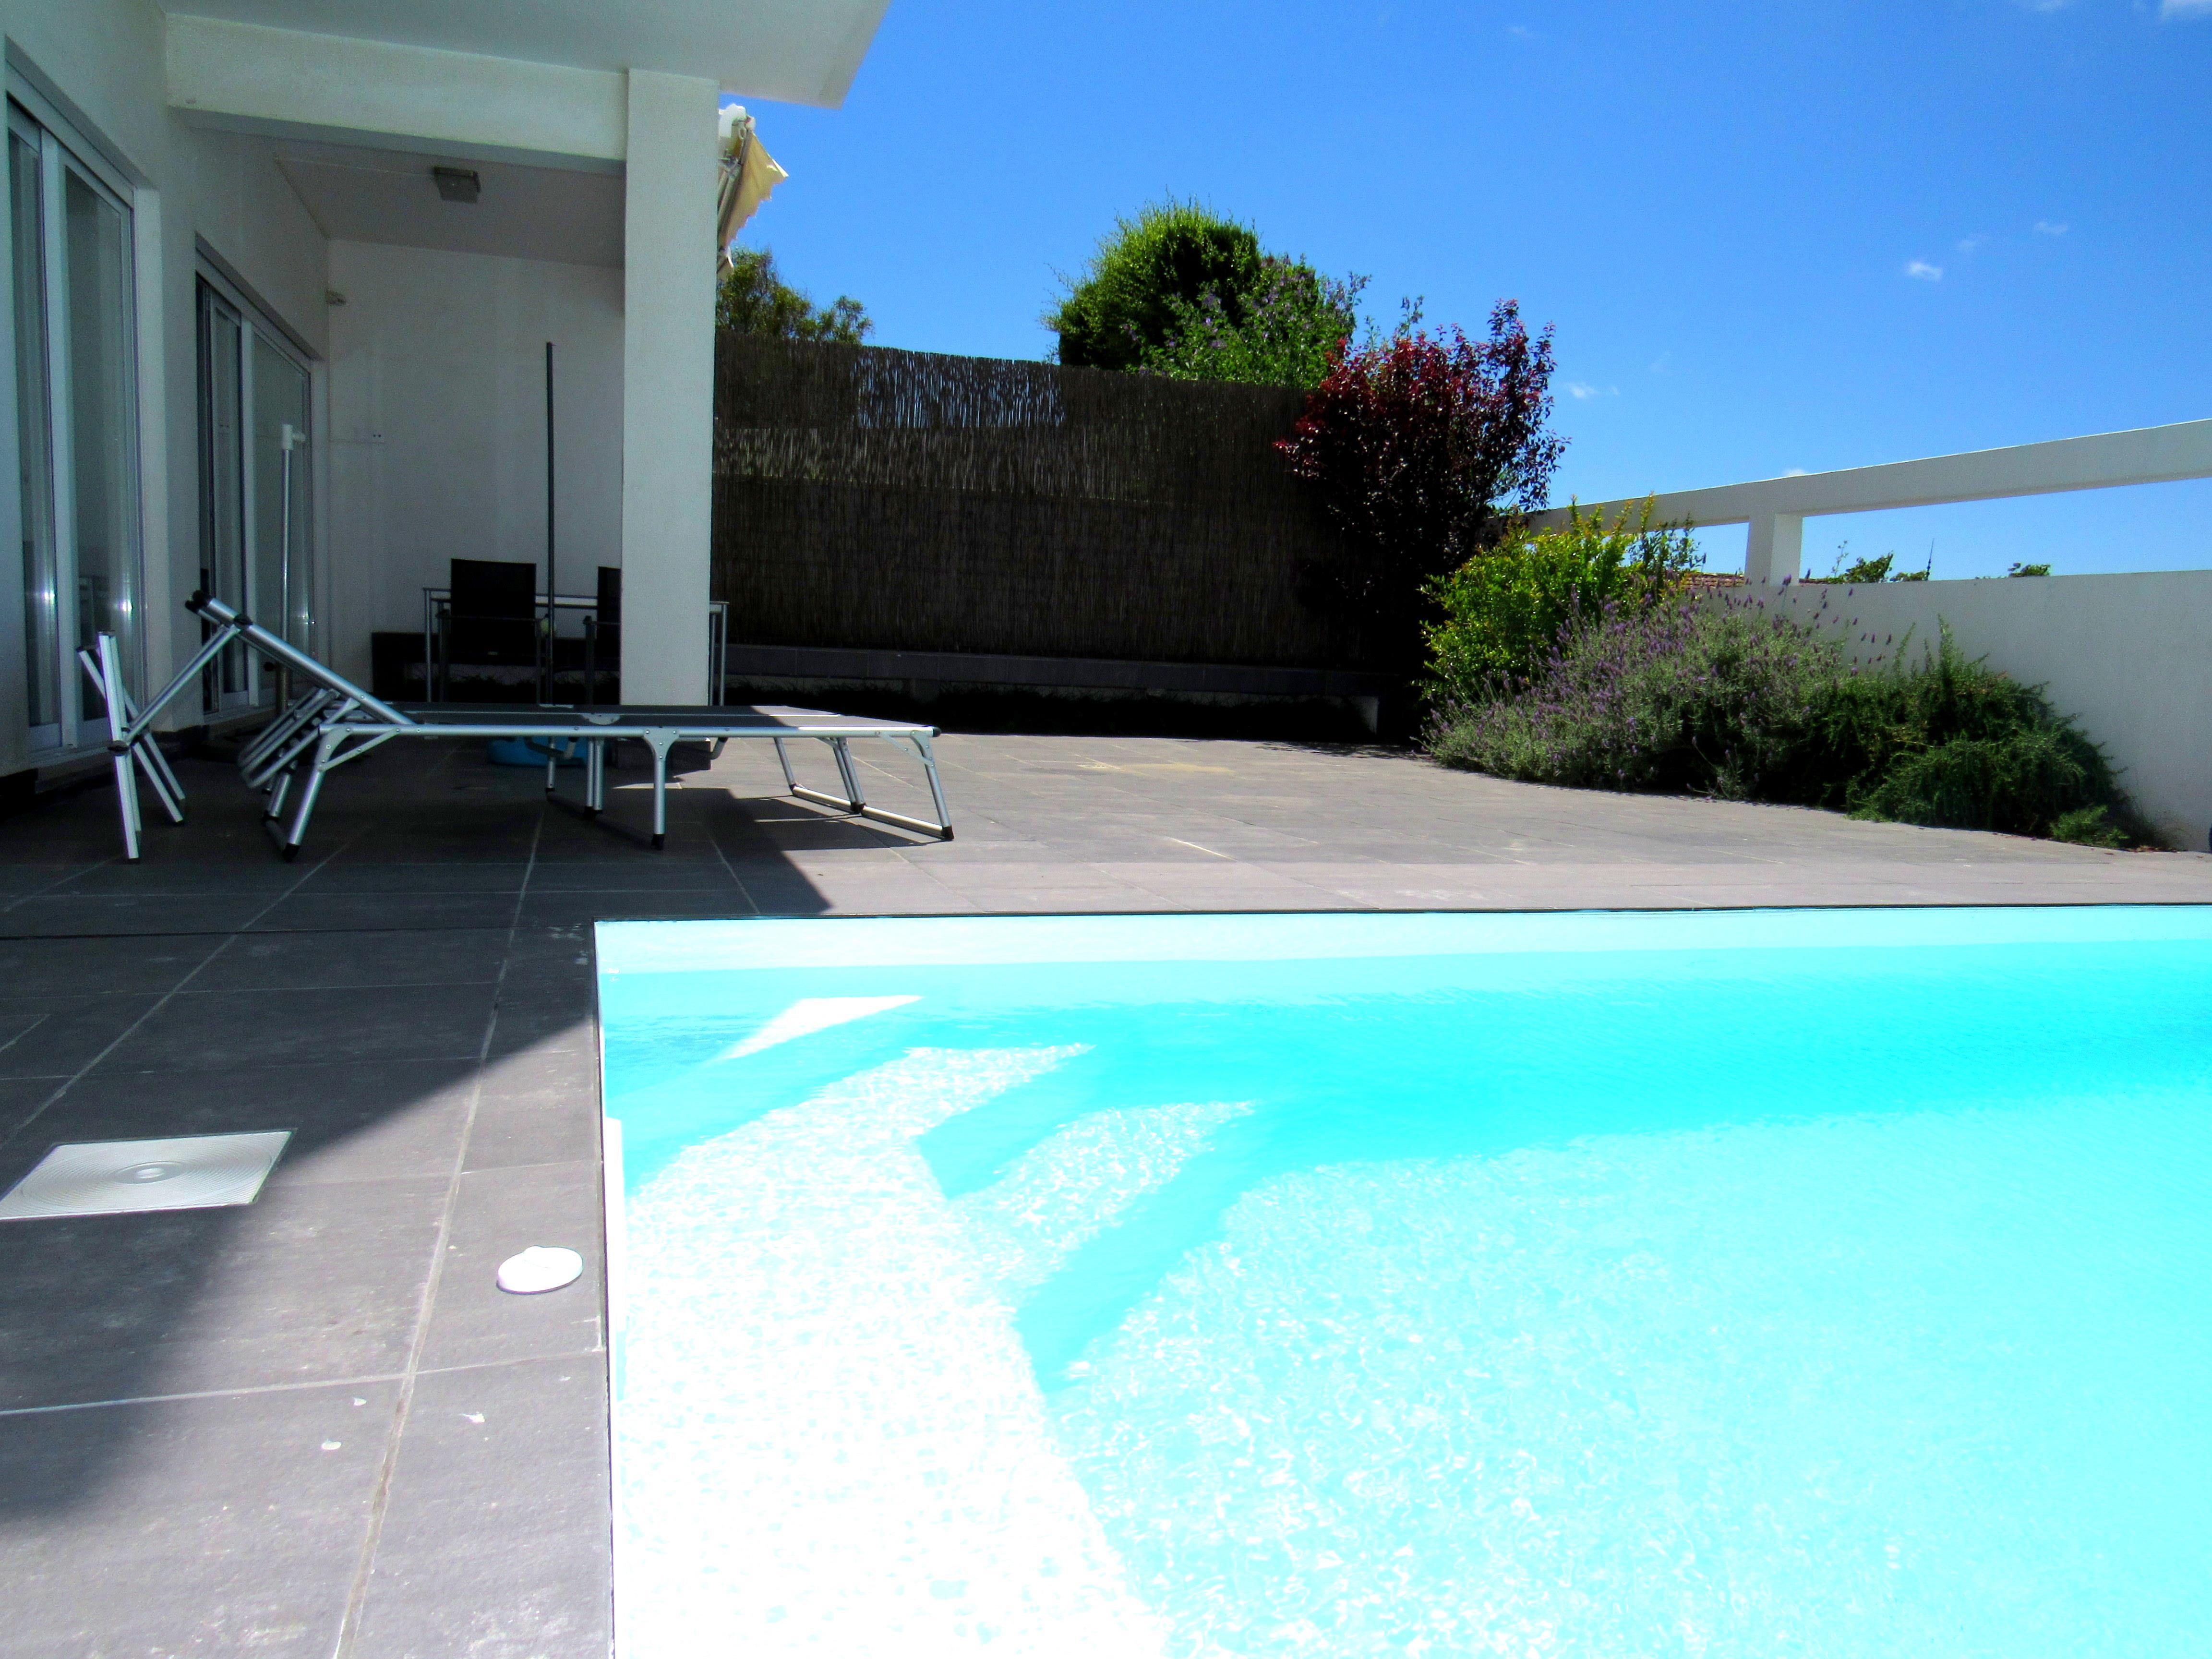 Moradia para Venda às Semi-detached house, 3 bedrooms, for Sale Oeiras, Lisboa, Portugal